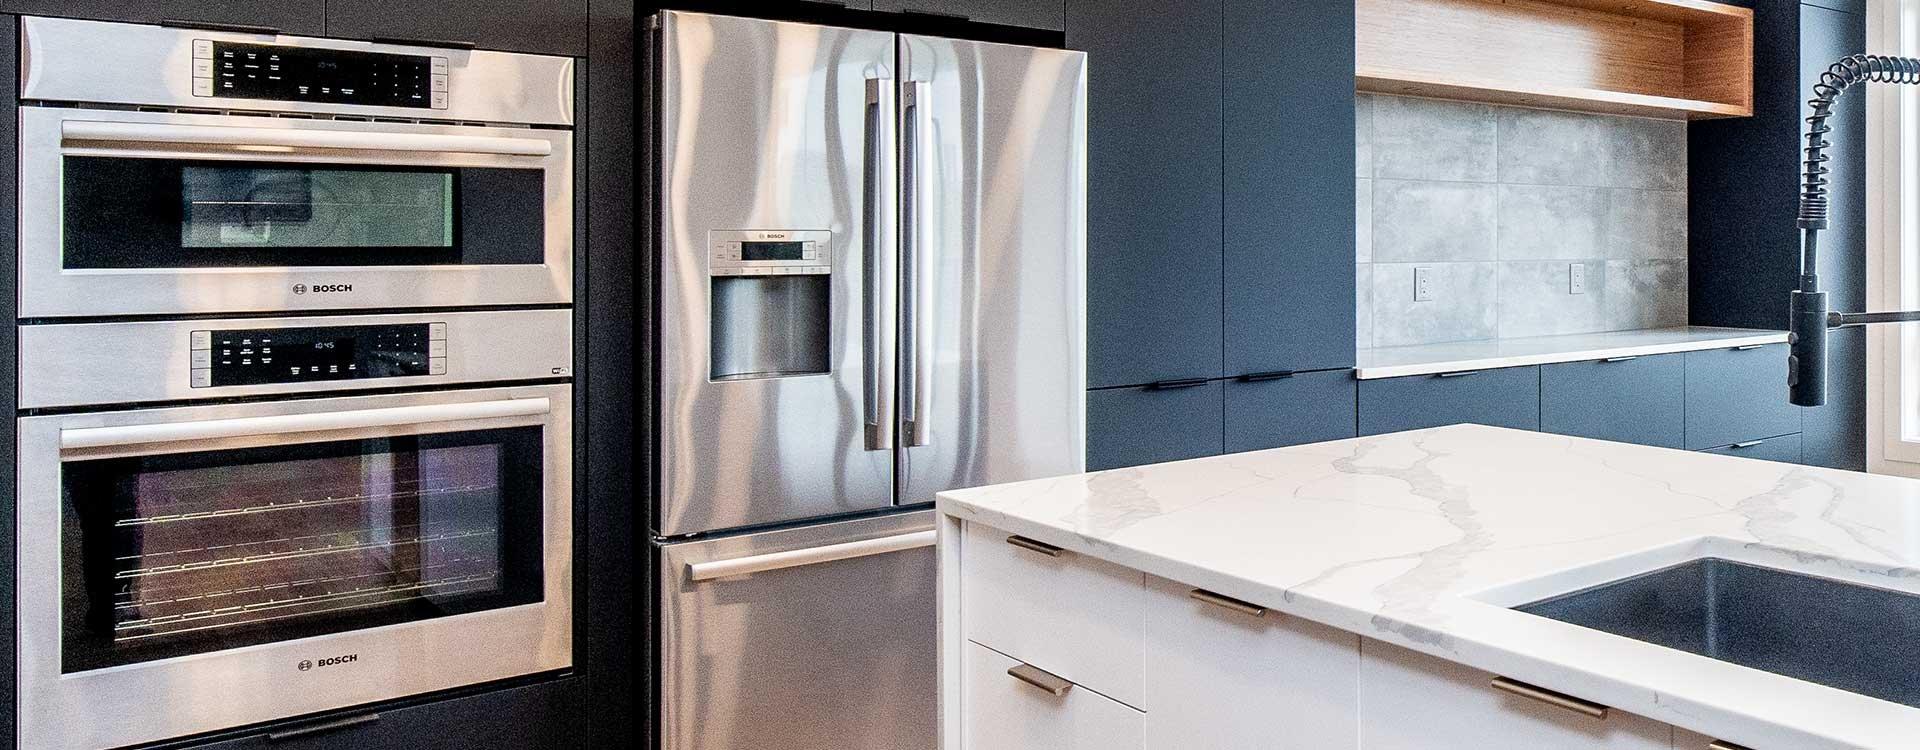 edmonton-home-builder-Kanvi-homes-appliances